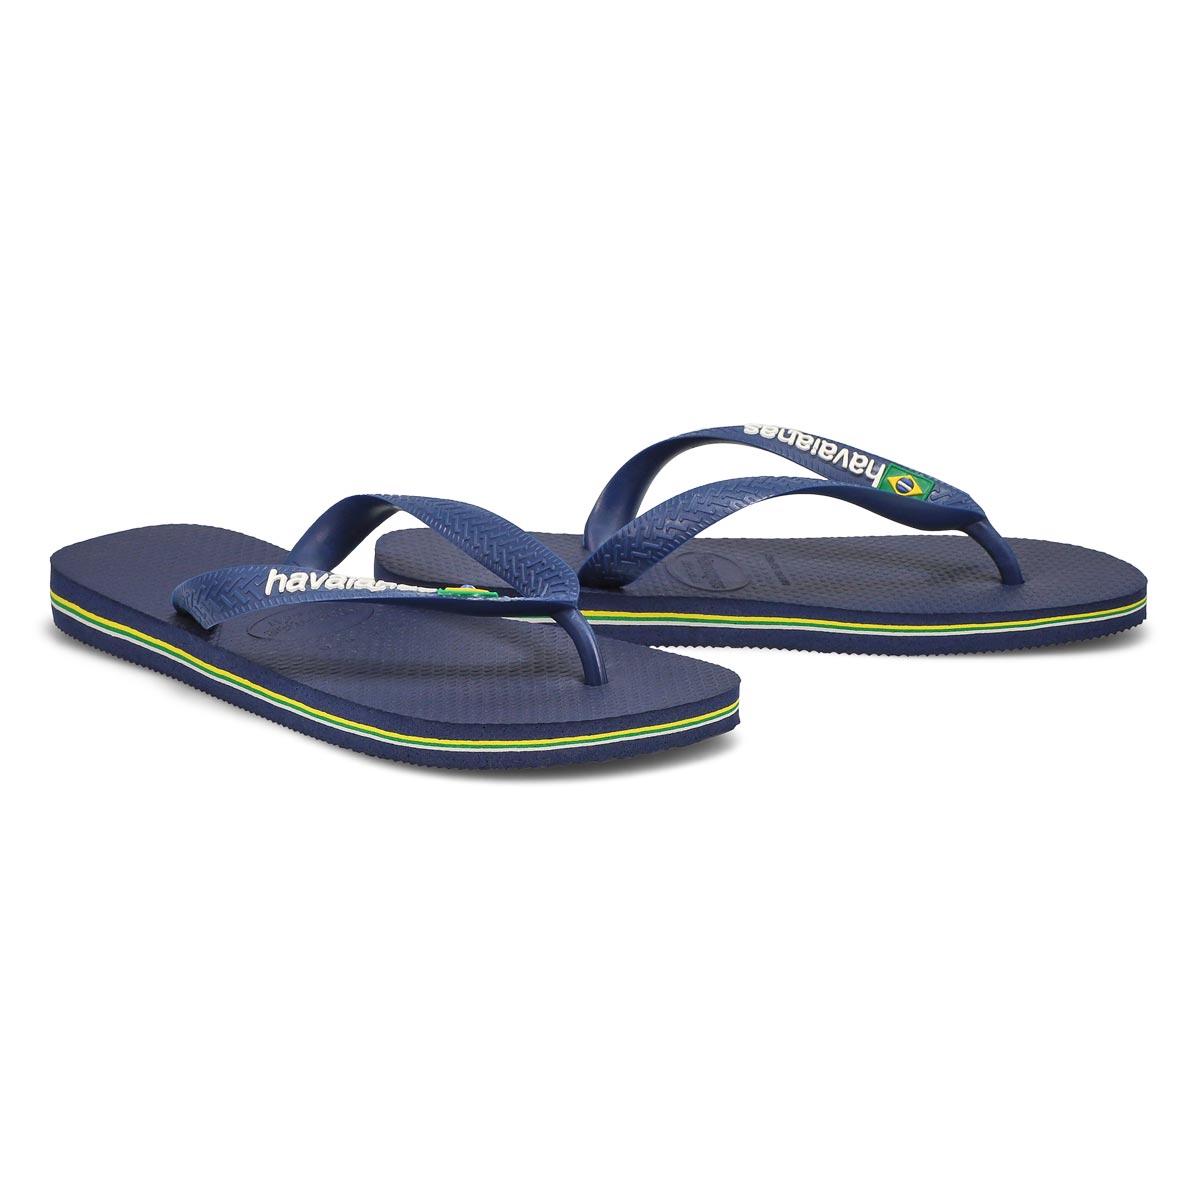 Lds Brazil Logo navy blue flip flop